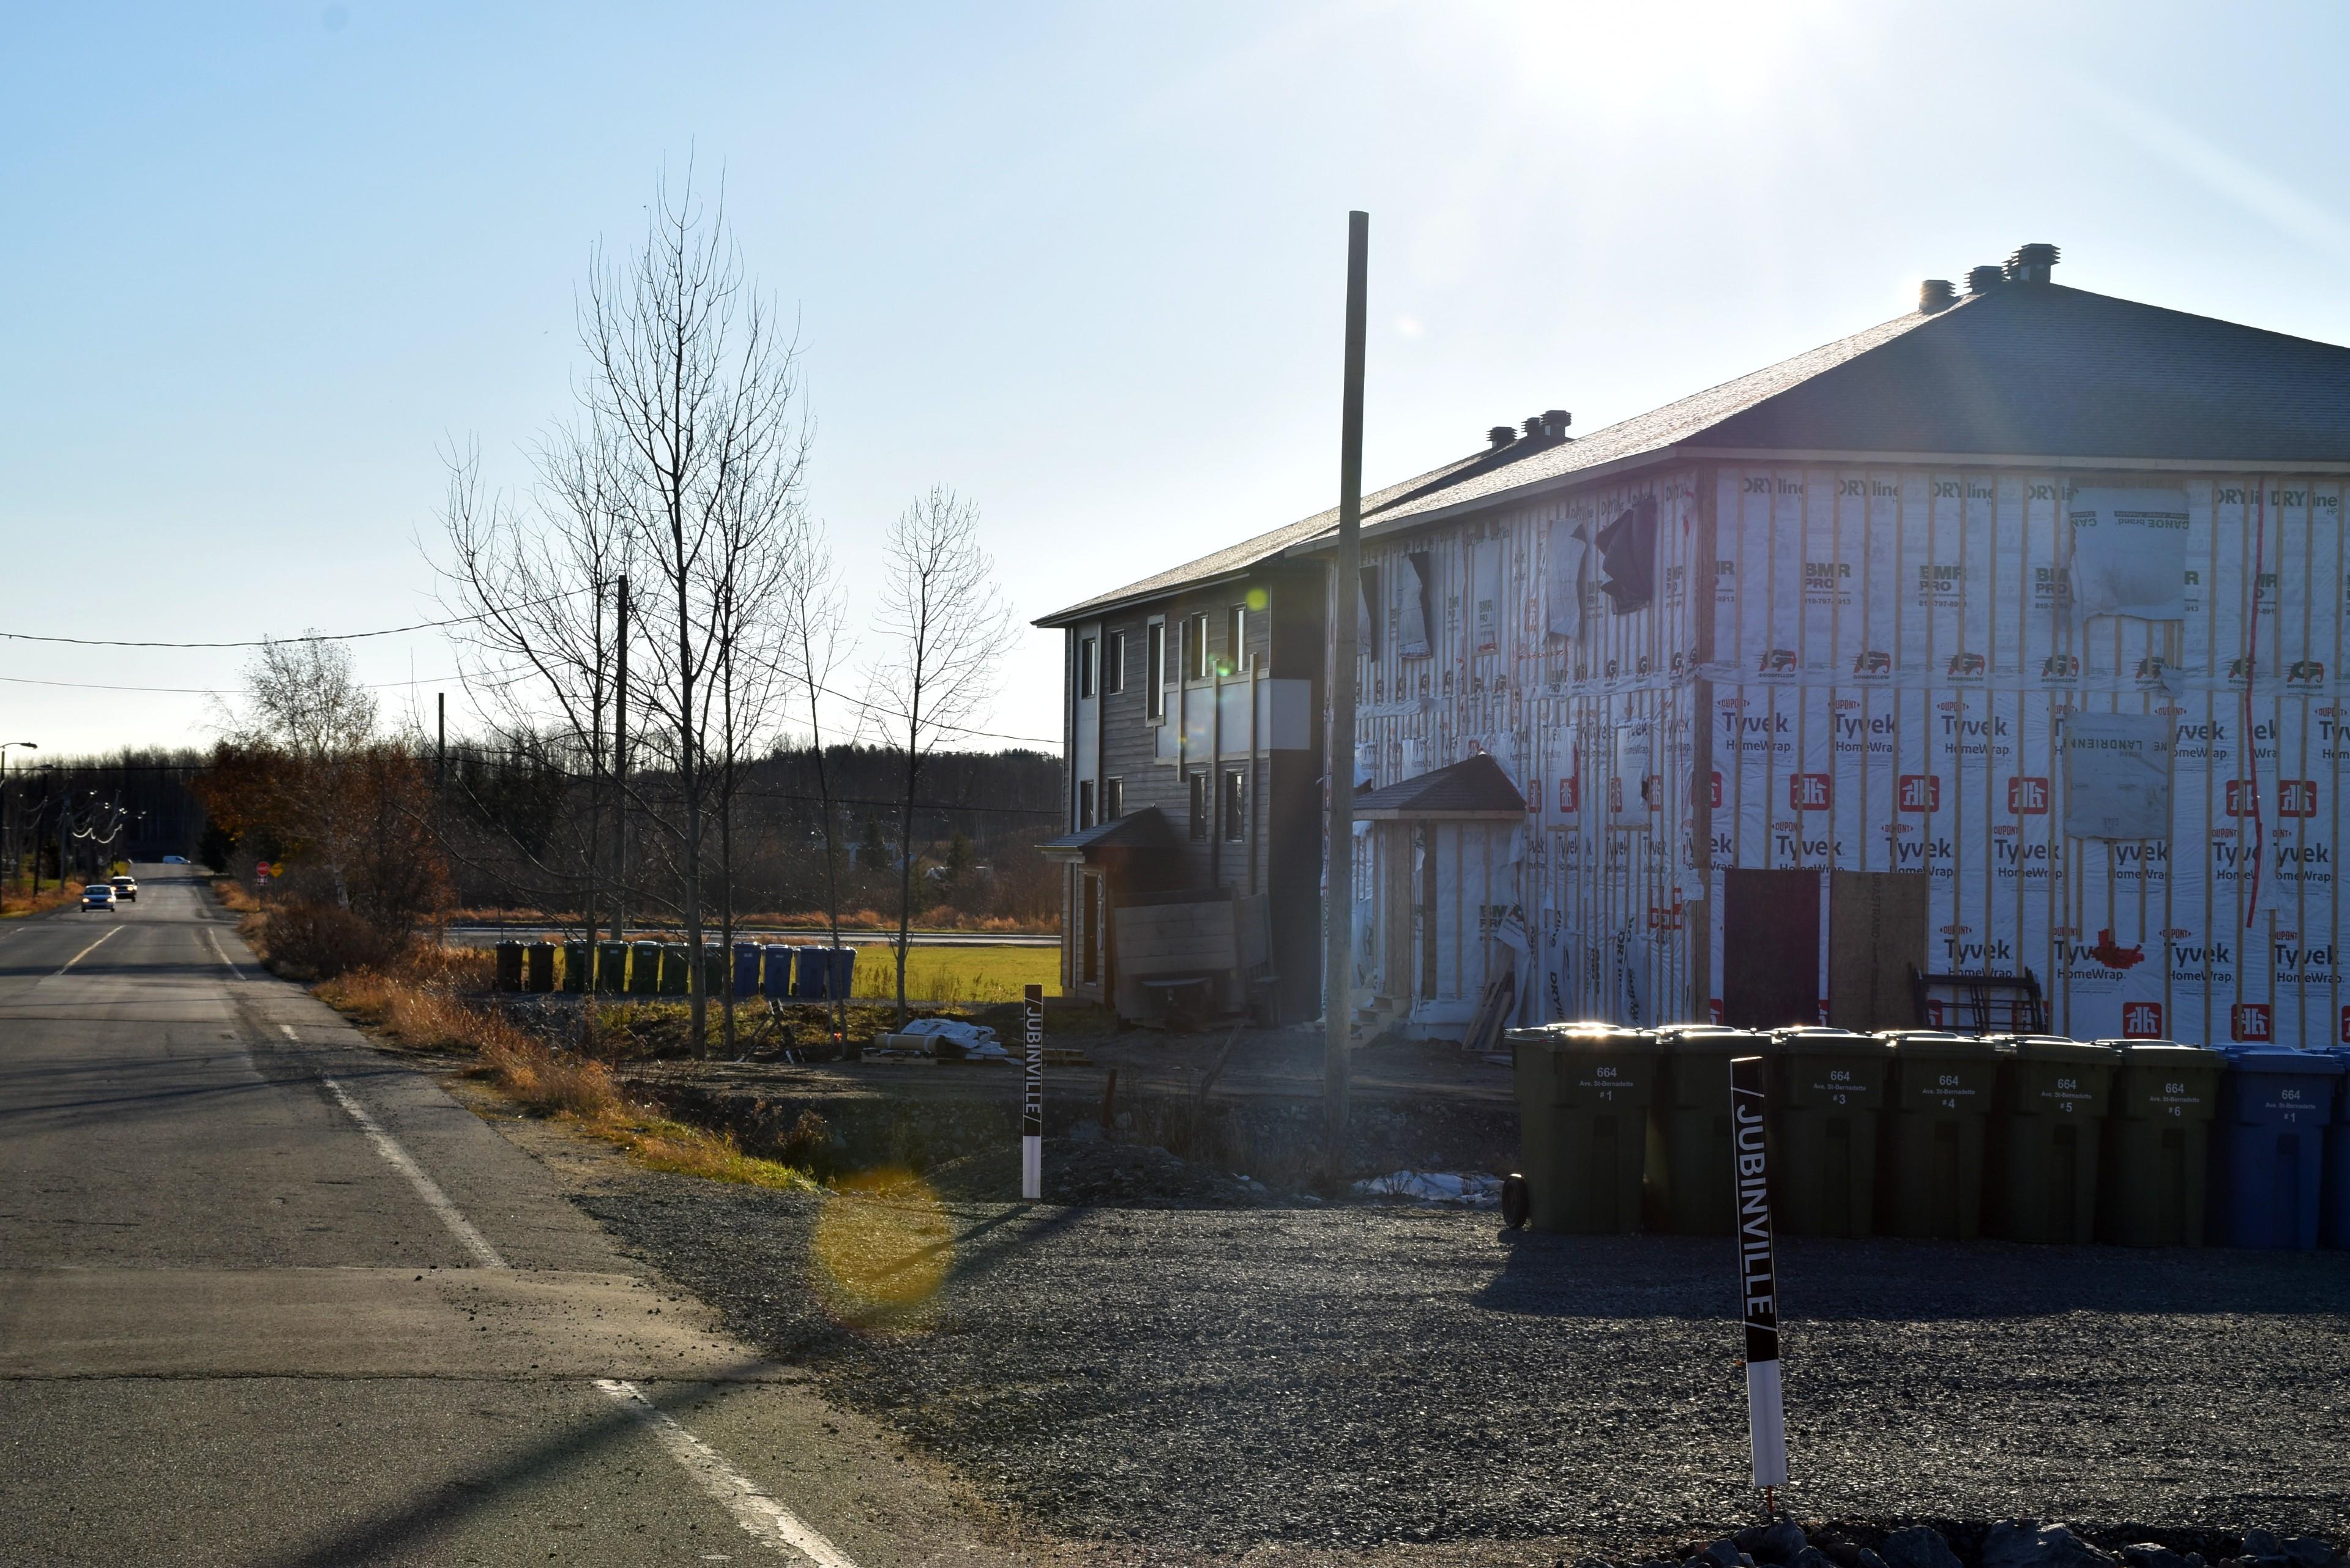 Terrains Ste-Bernadette rouyn-Noranda construction développement résidentiel maison tyvek